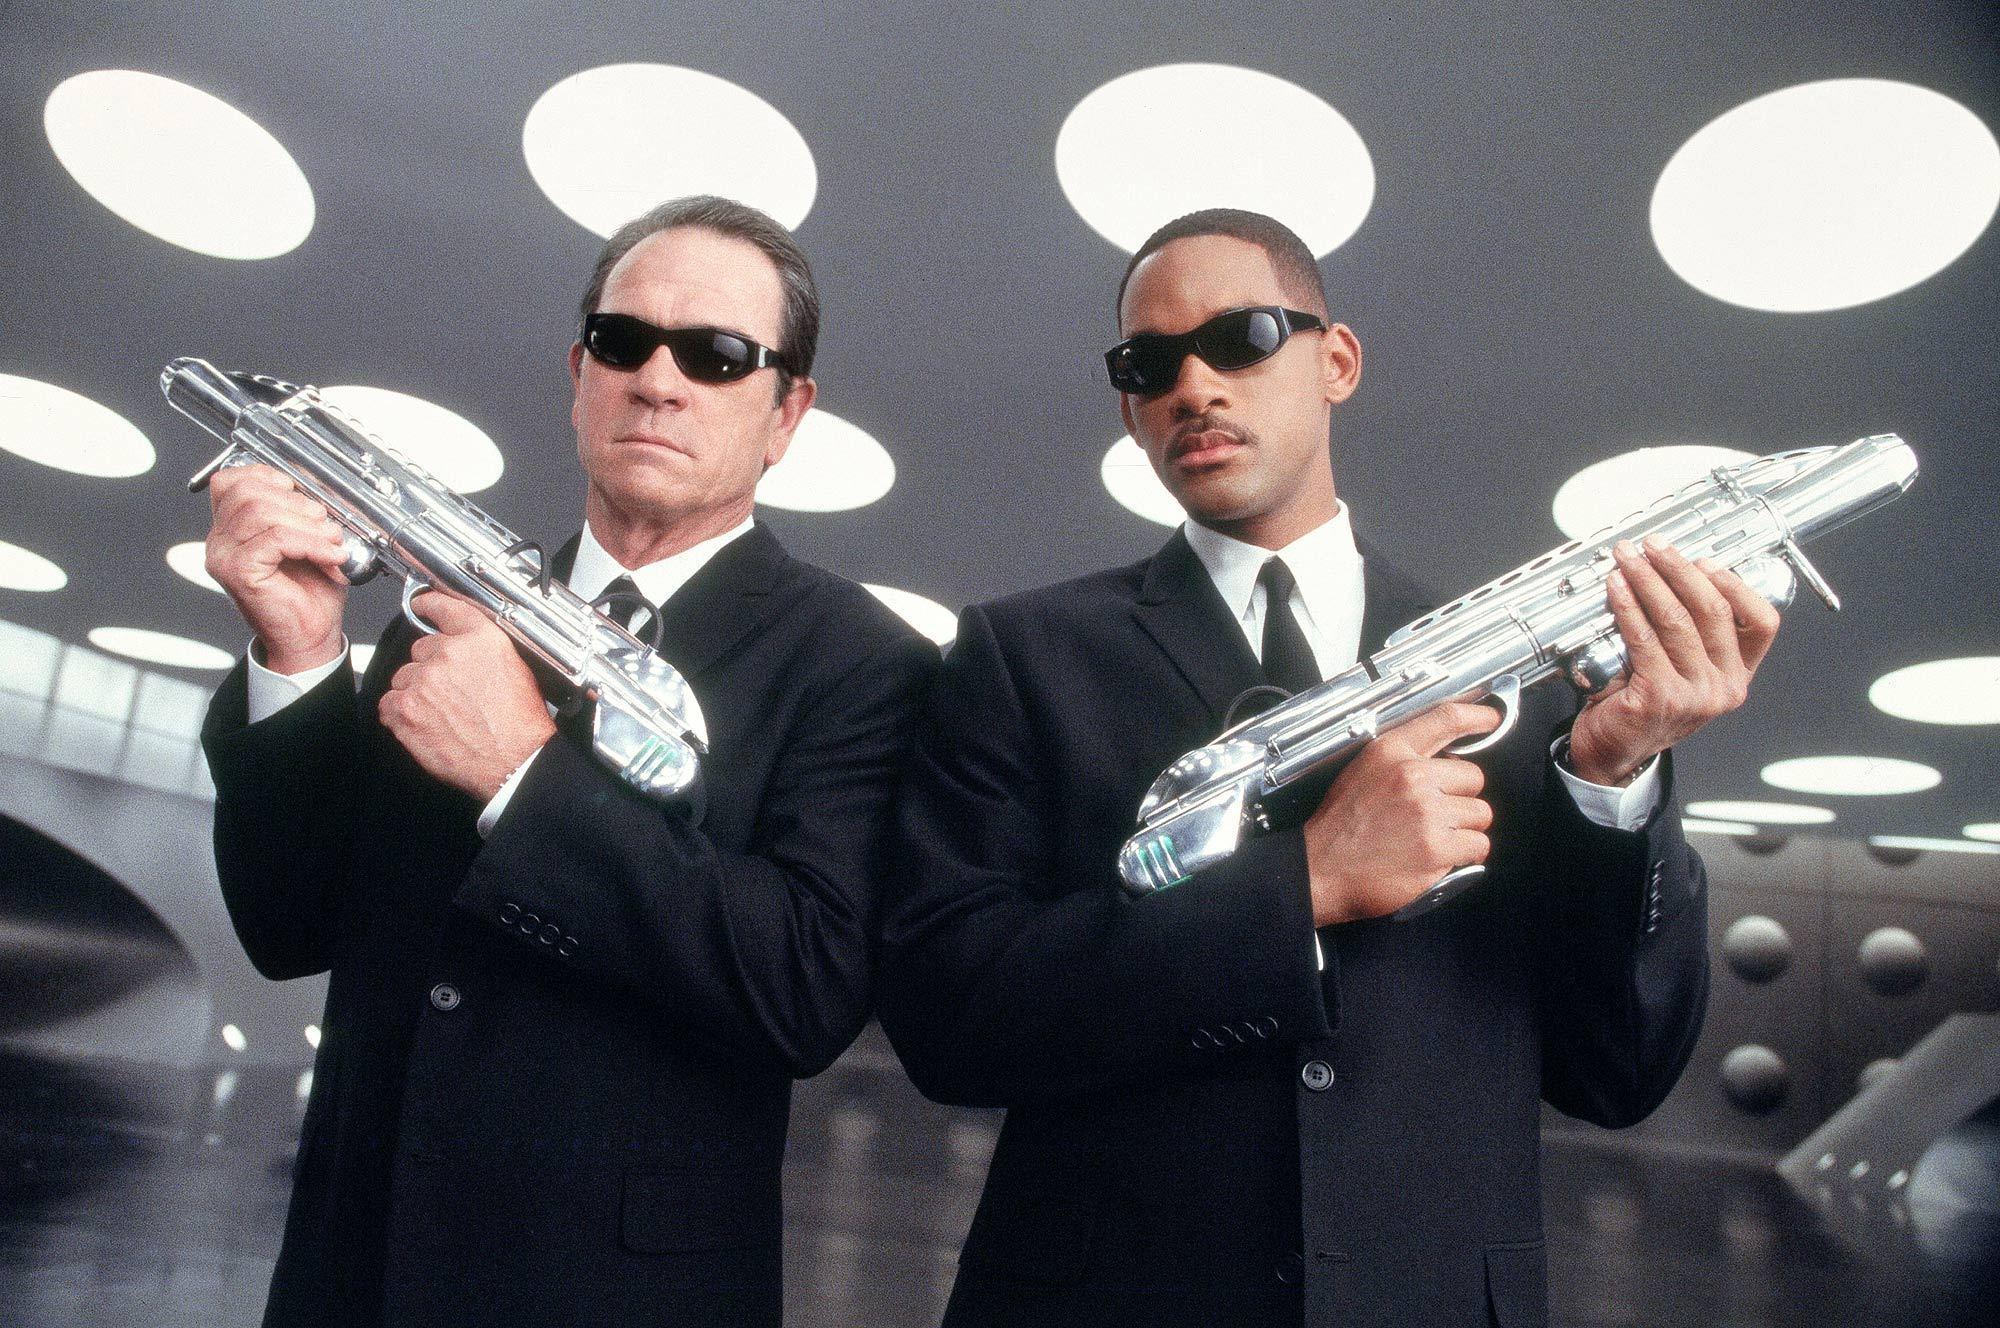 MIB-cop-movies-8303999-2000-1328